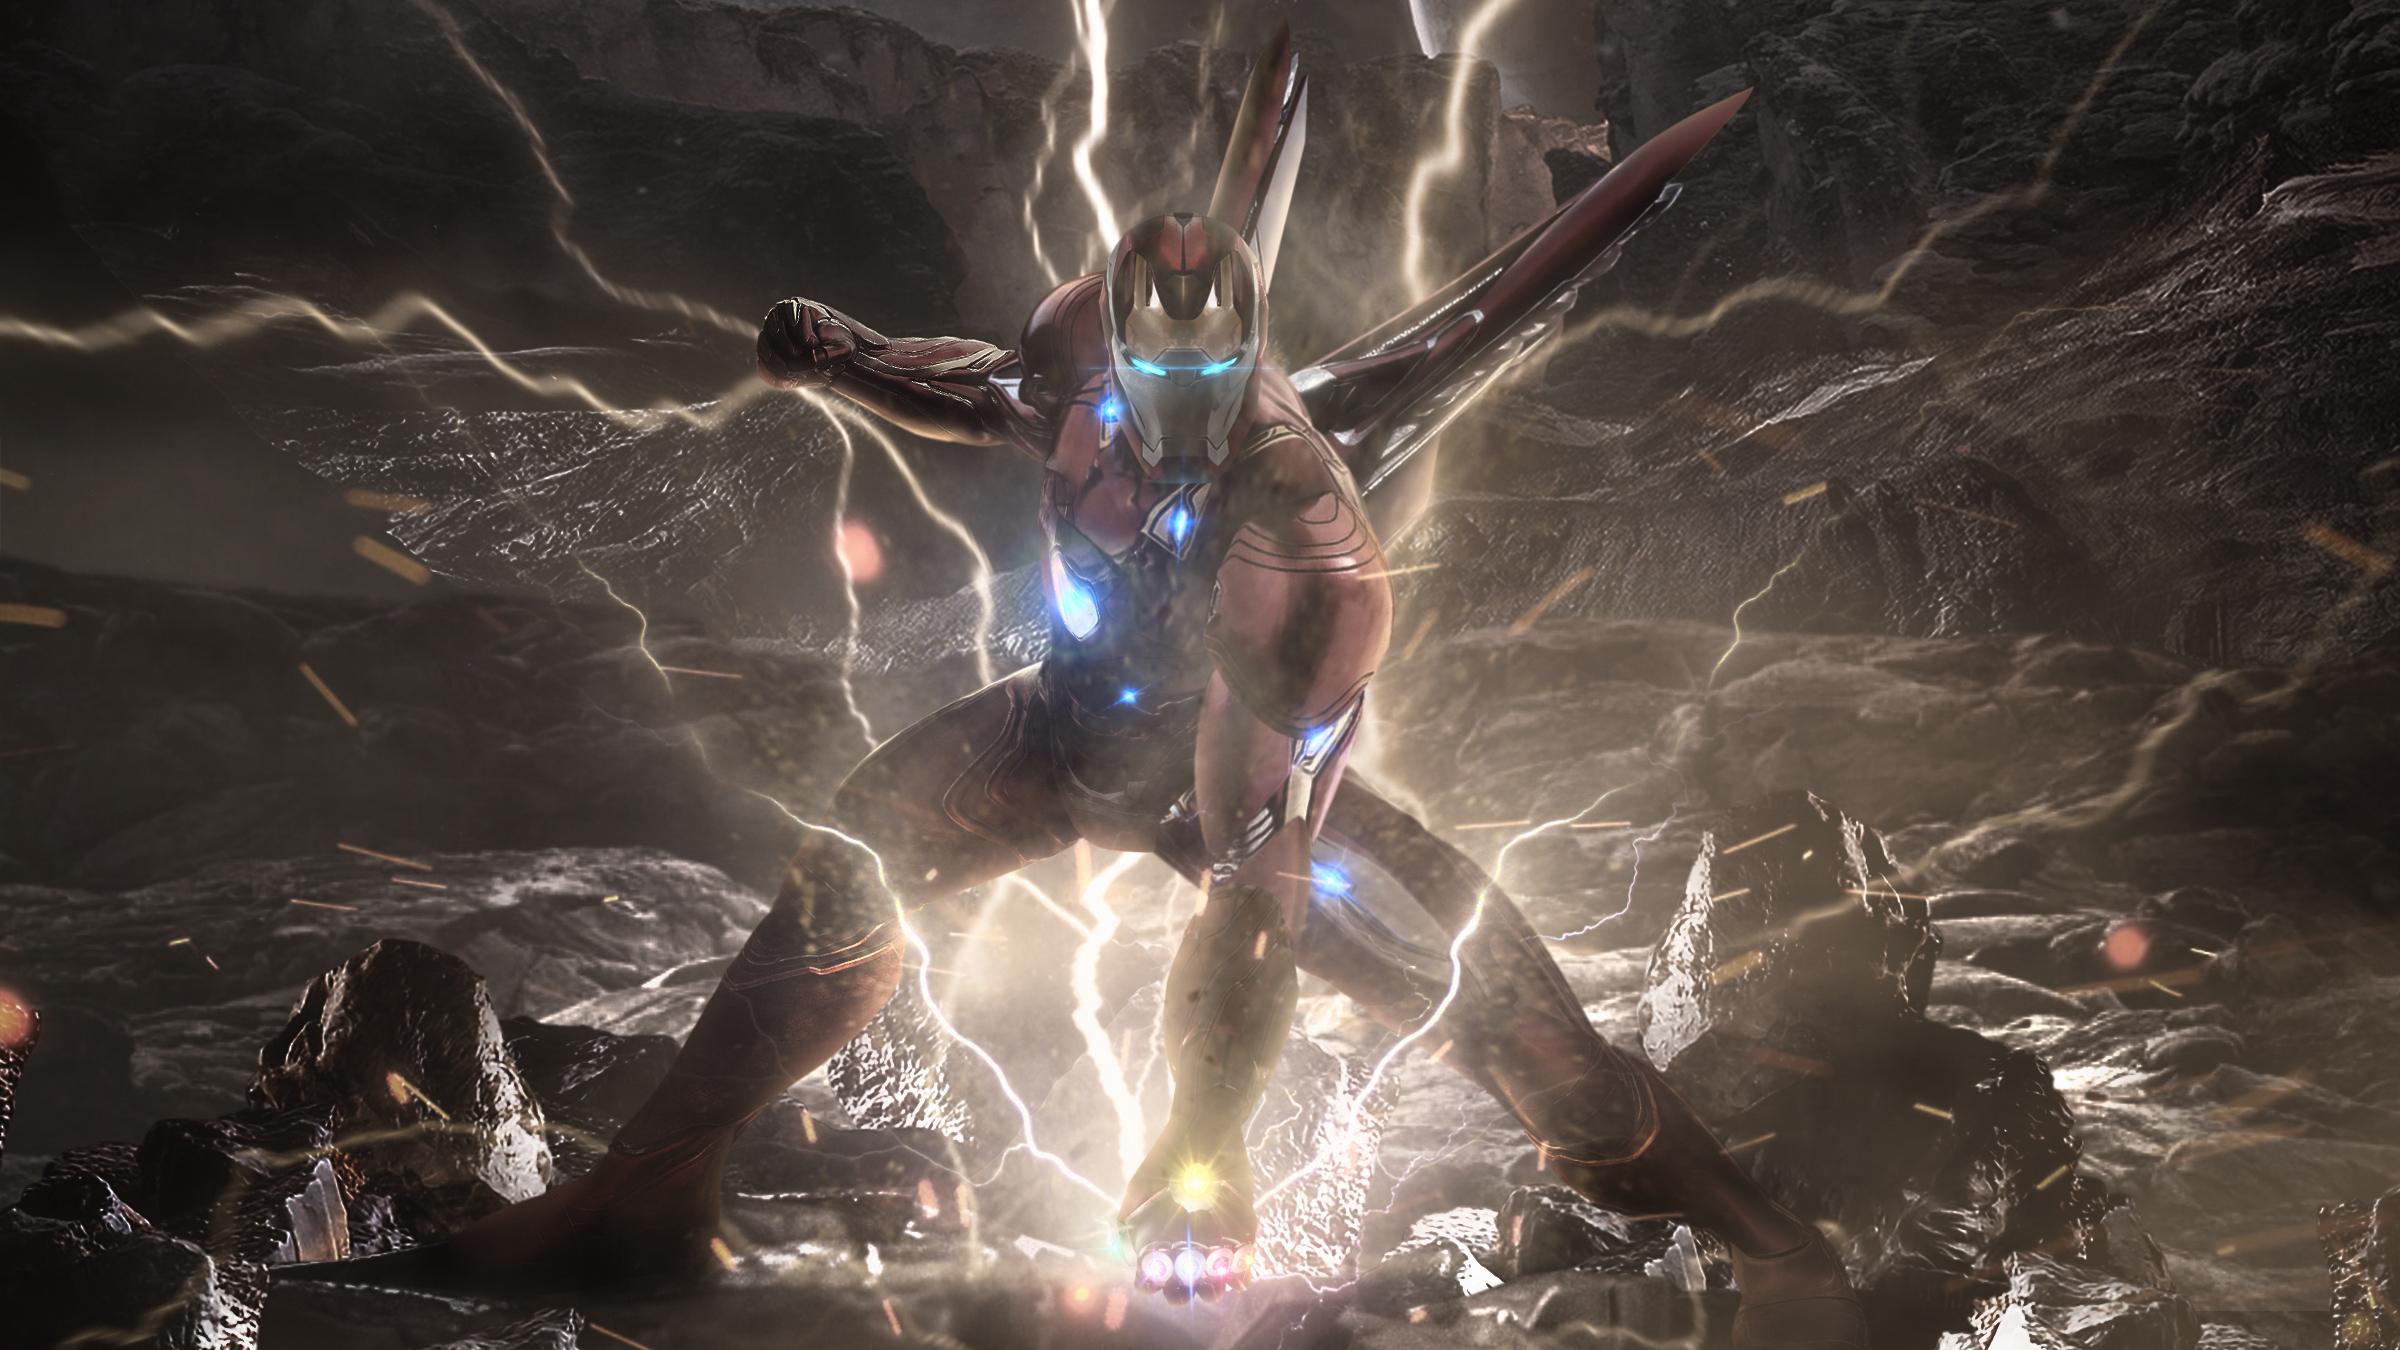 Iron Man HD Wallpaper Background Image 2400x1350 ID969582 2400x1350